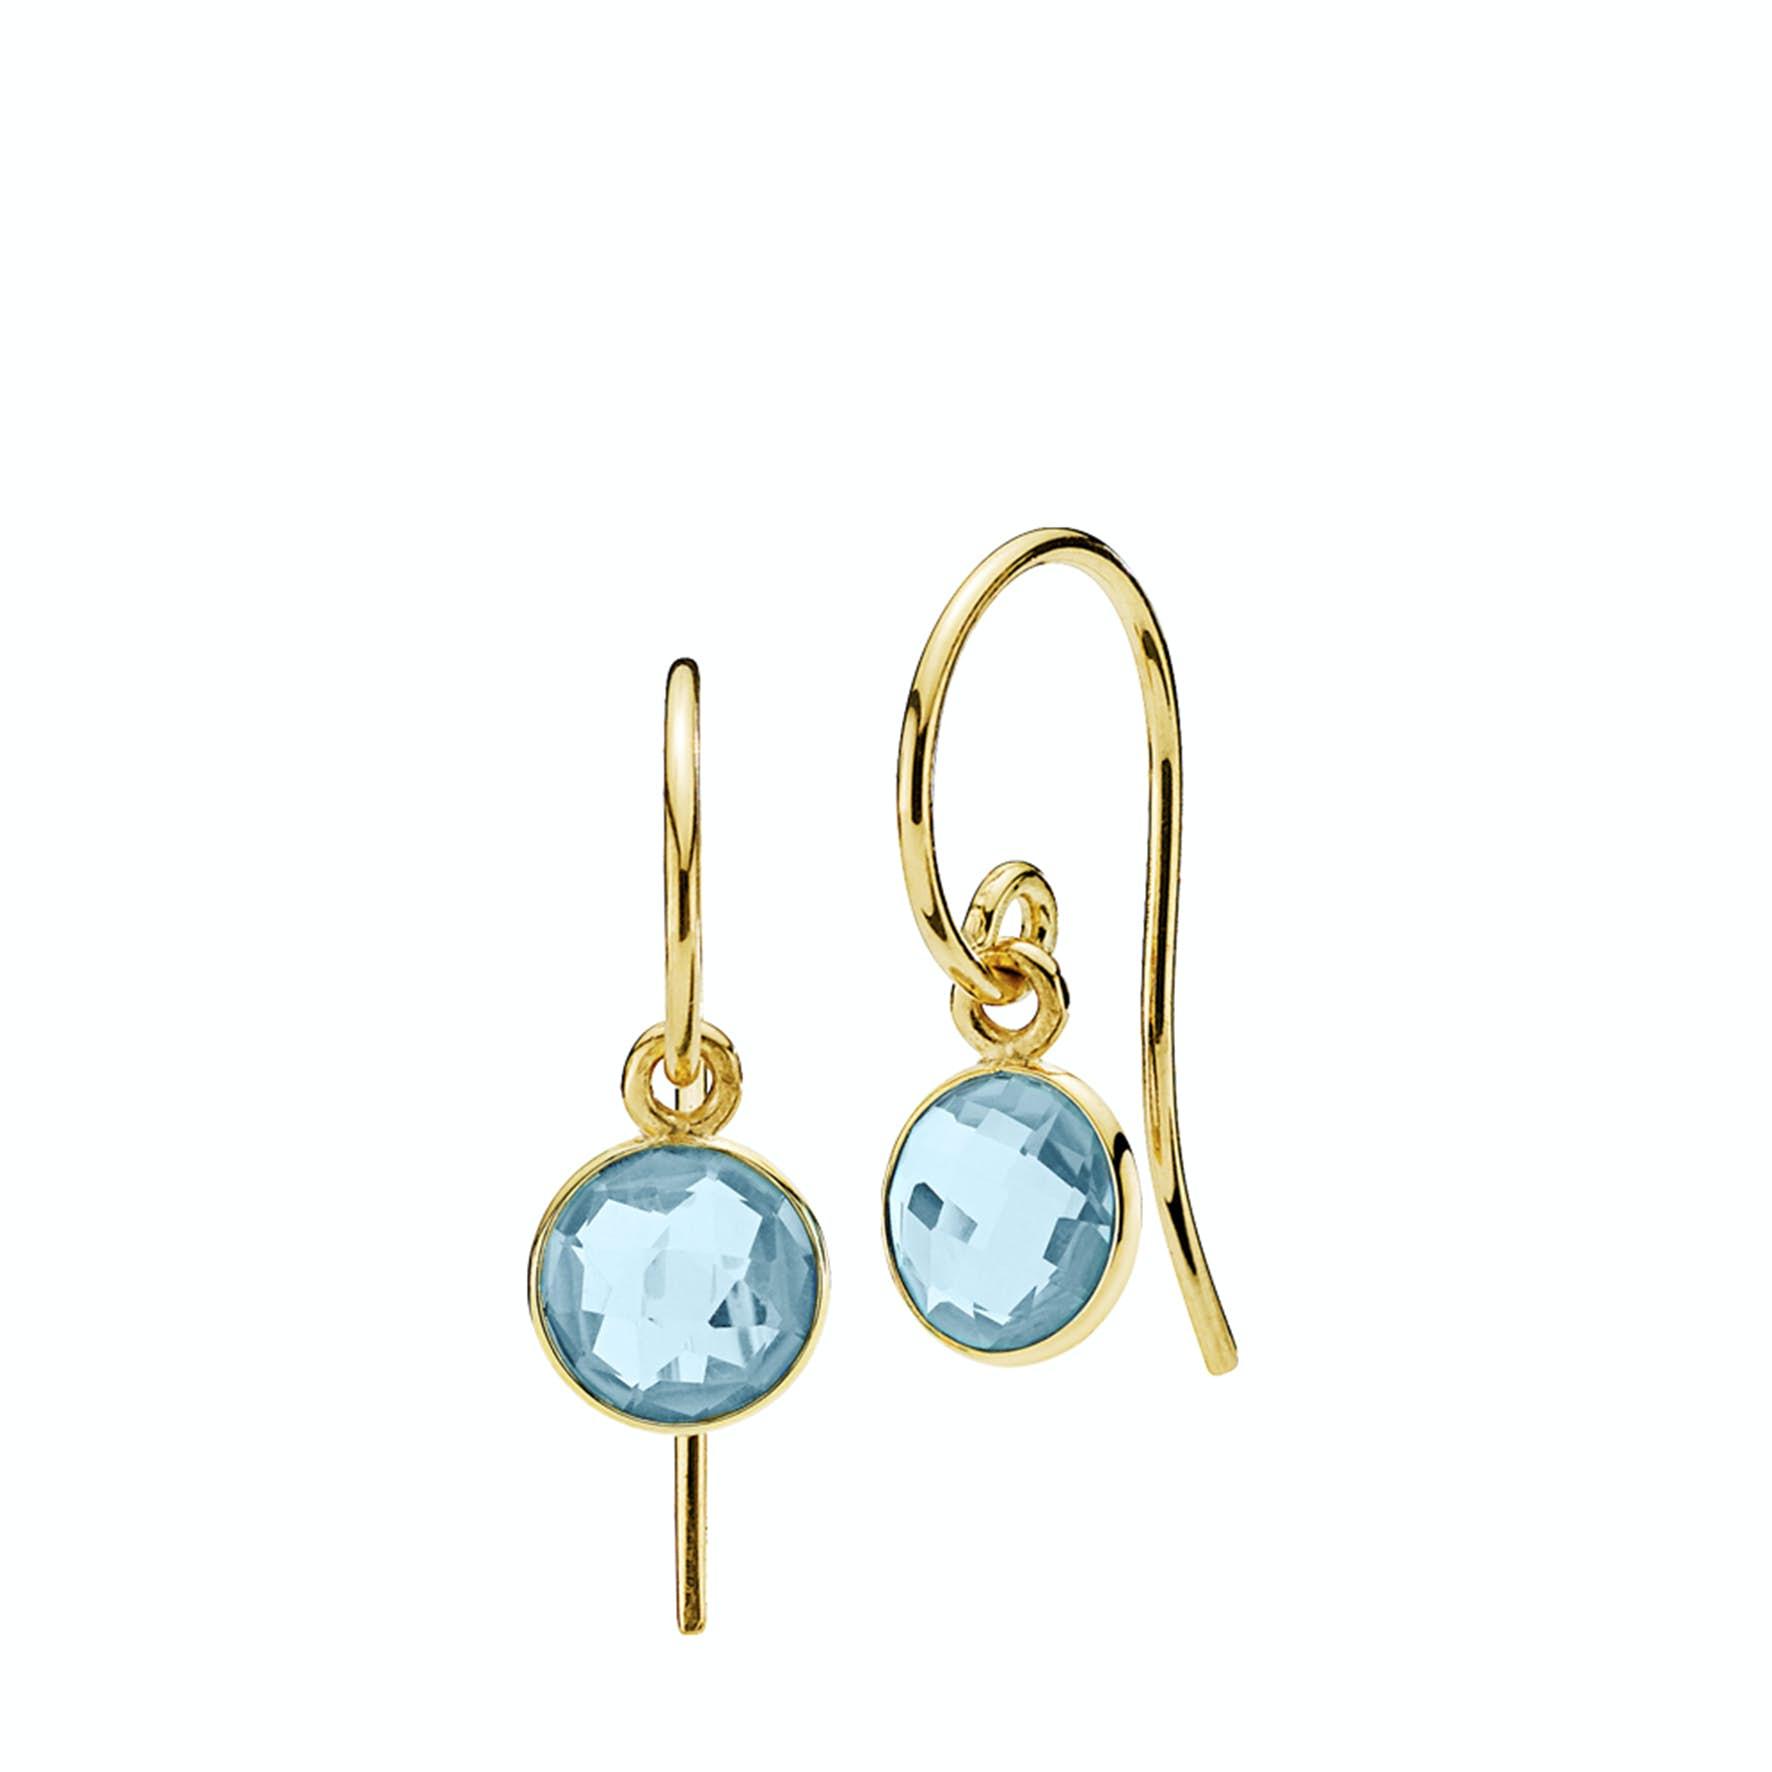 Prima Donna Earrings Small Aqua Blue von Izabel Camille in Vergoldet-Silber Sterling 925 Aqua Blue